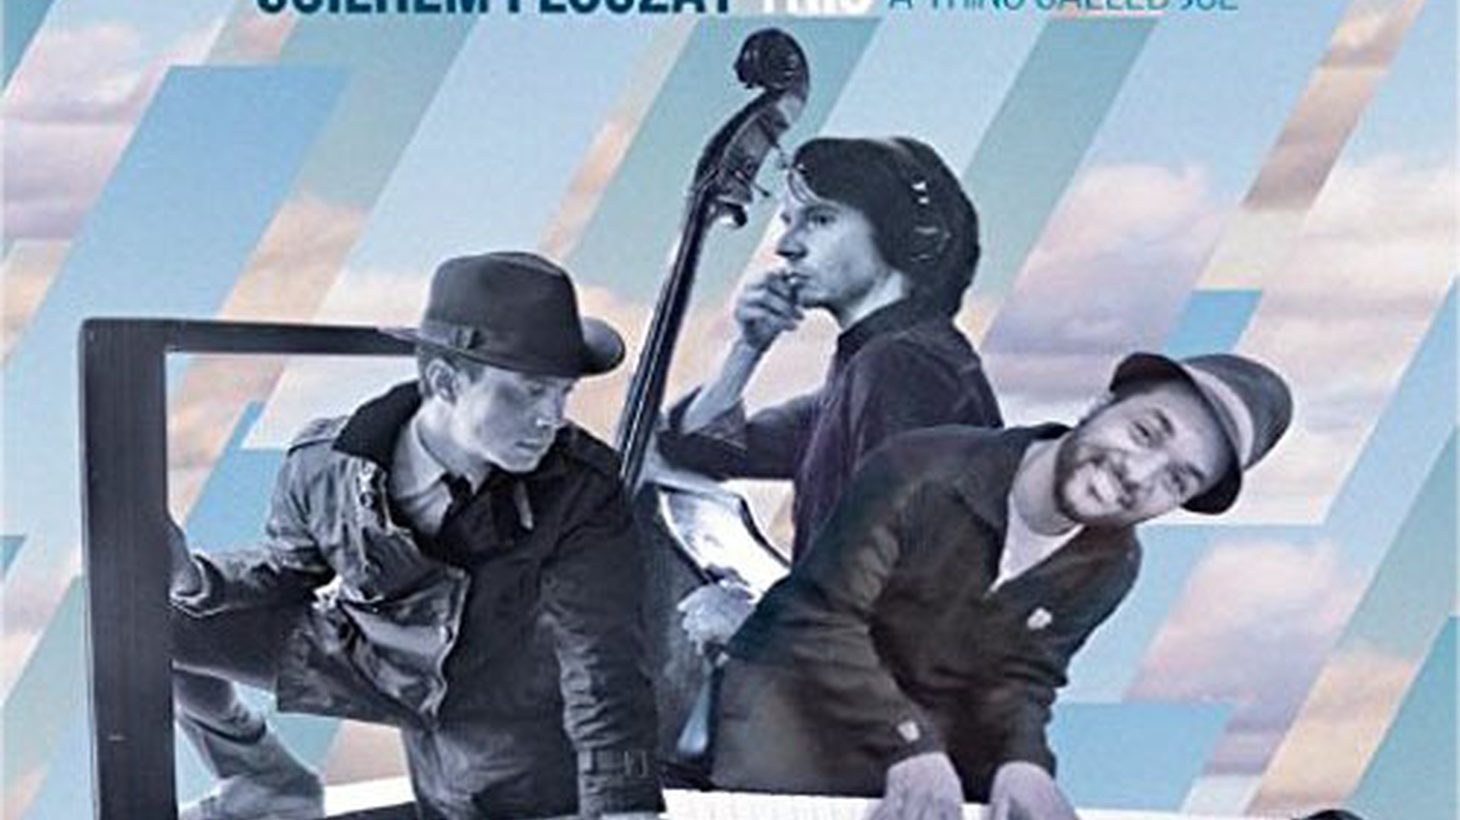 This week Rhythm Planet showcases new music from Gregory Porter, Mark Murphy, Guilhem Flouzat, Lilla Vargen, Anouar Brahem, and others.